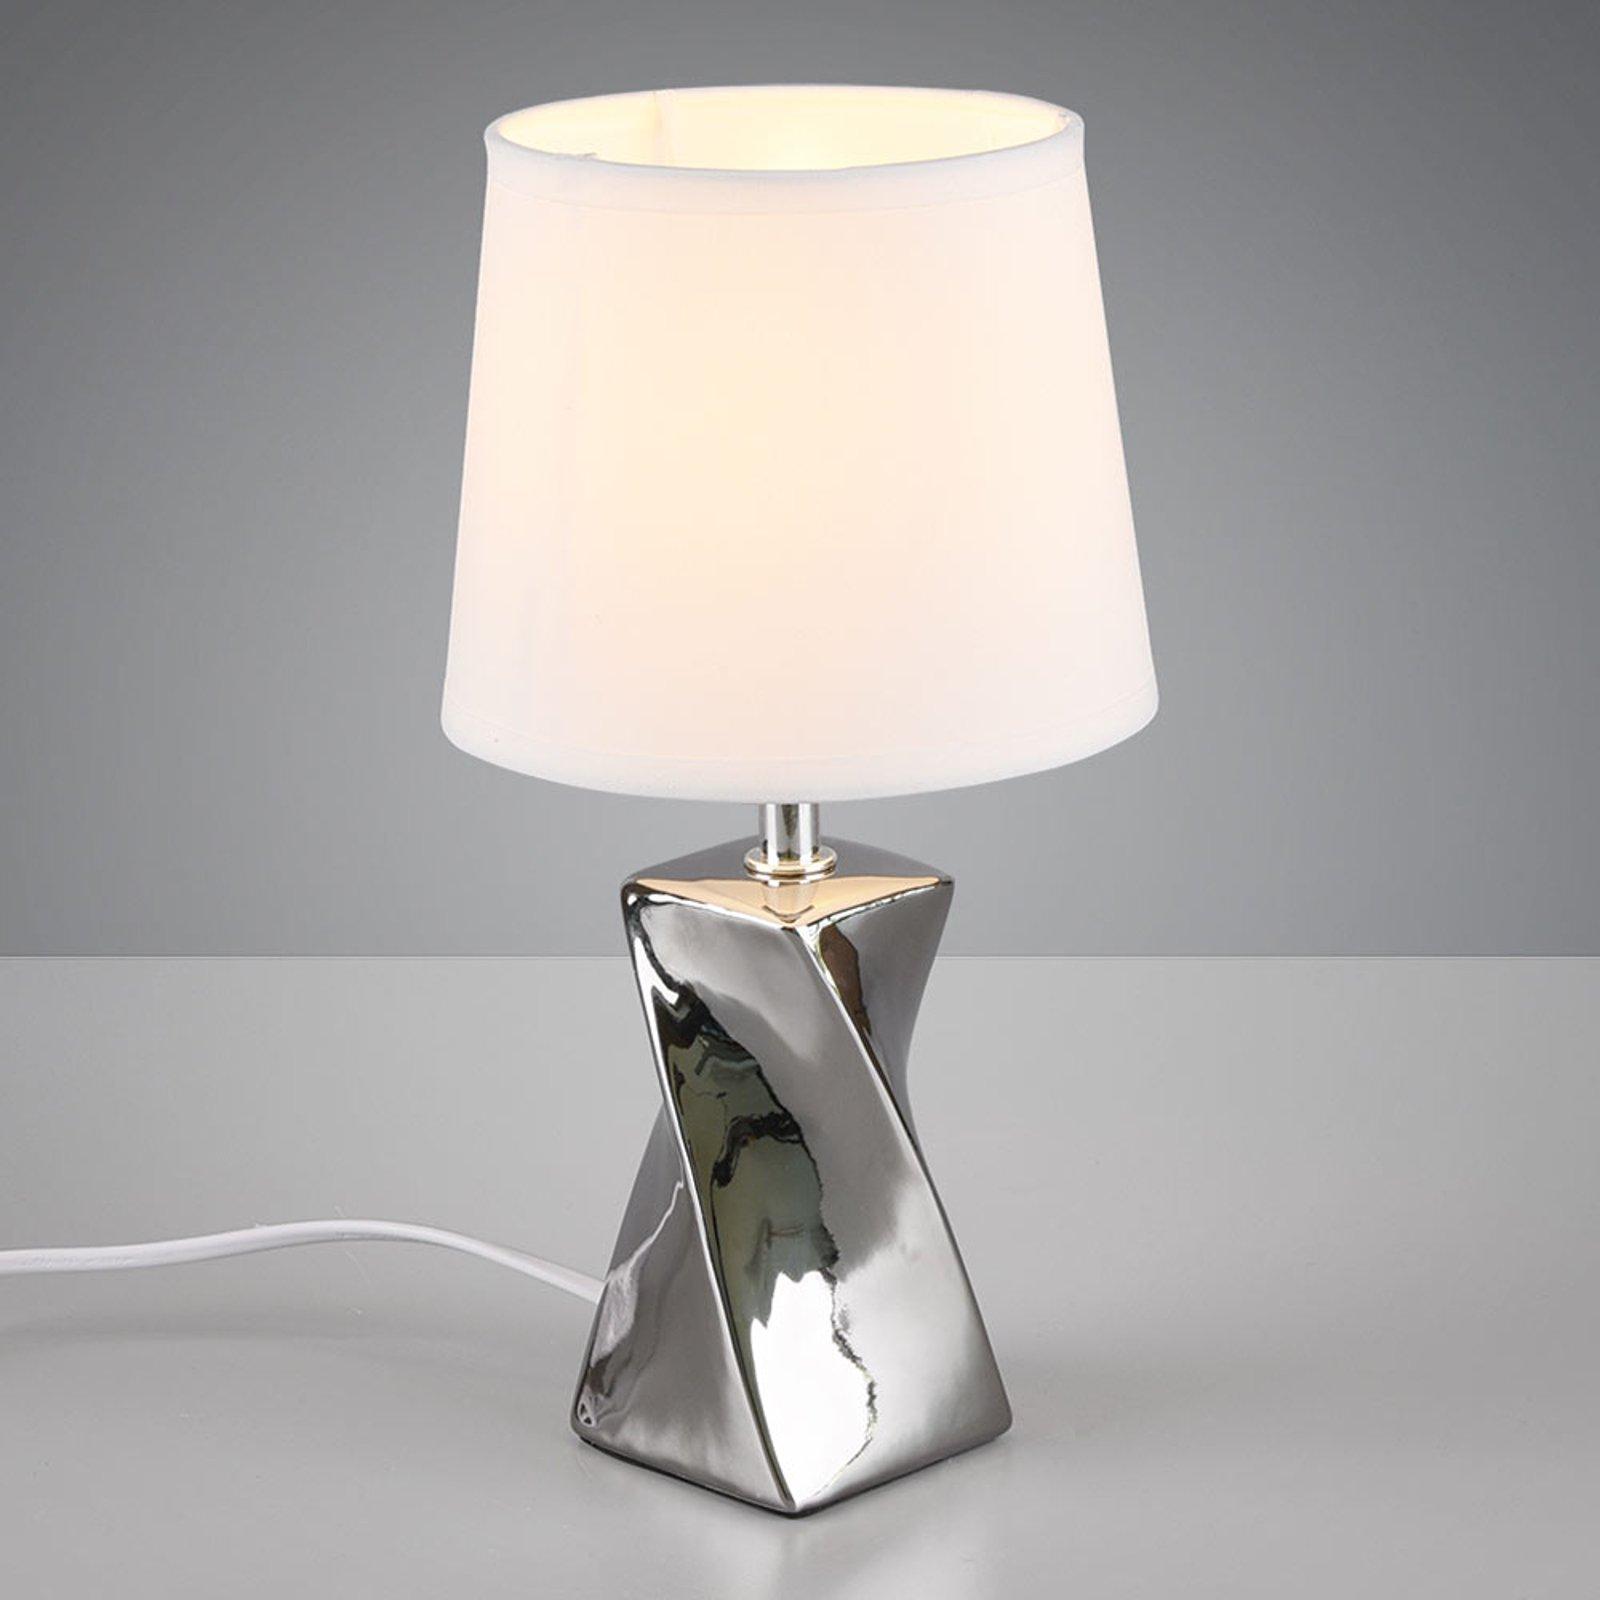 Bordlampe Abeba, Ø 15 cm, hvit-sølv